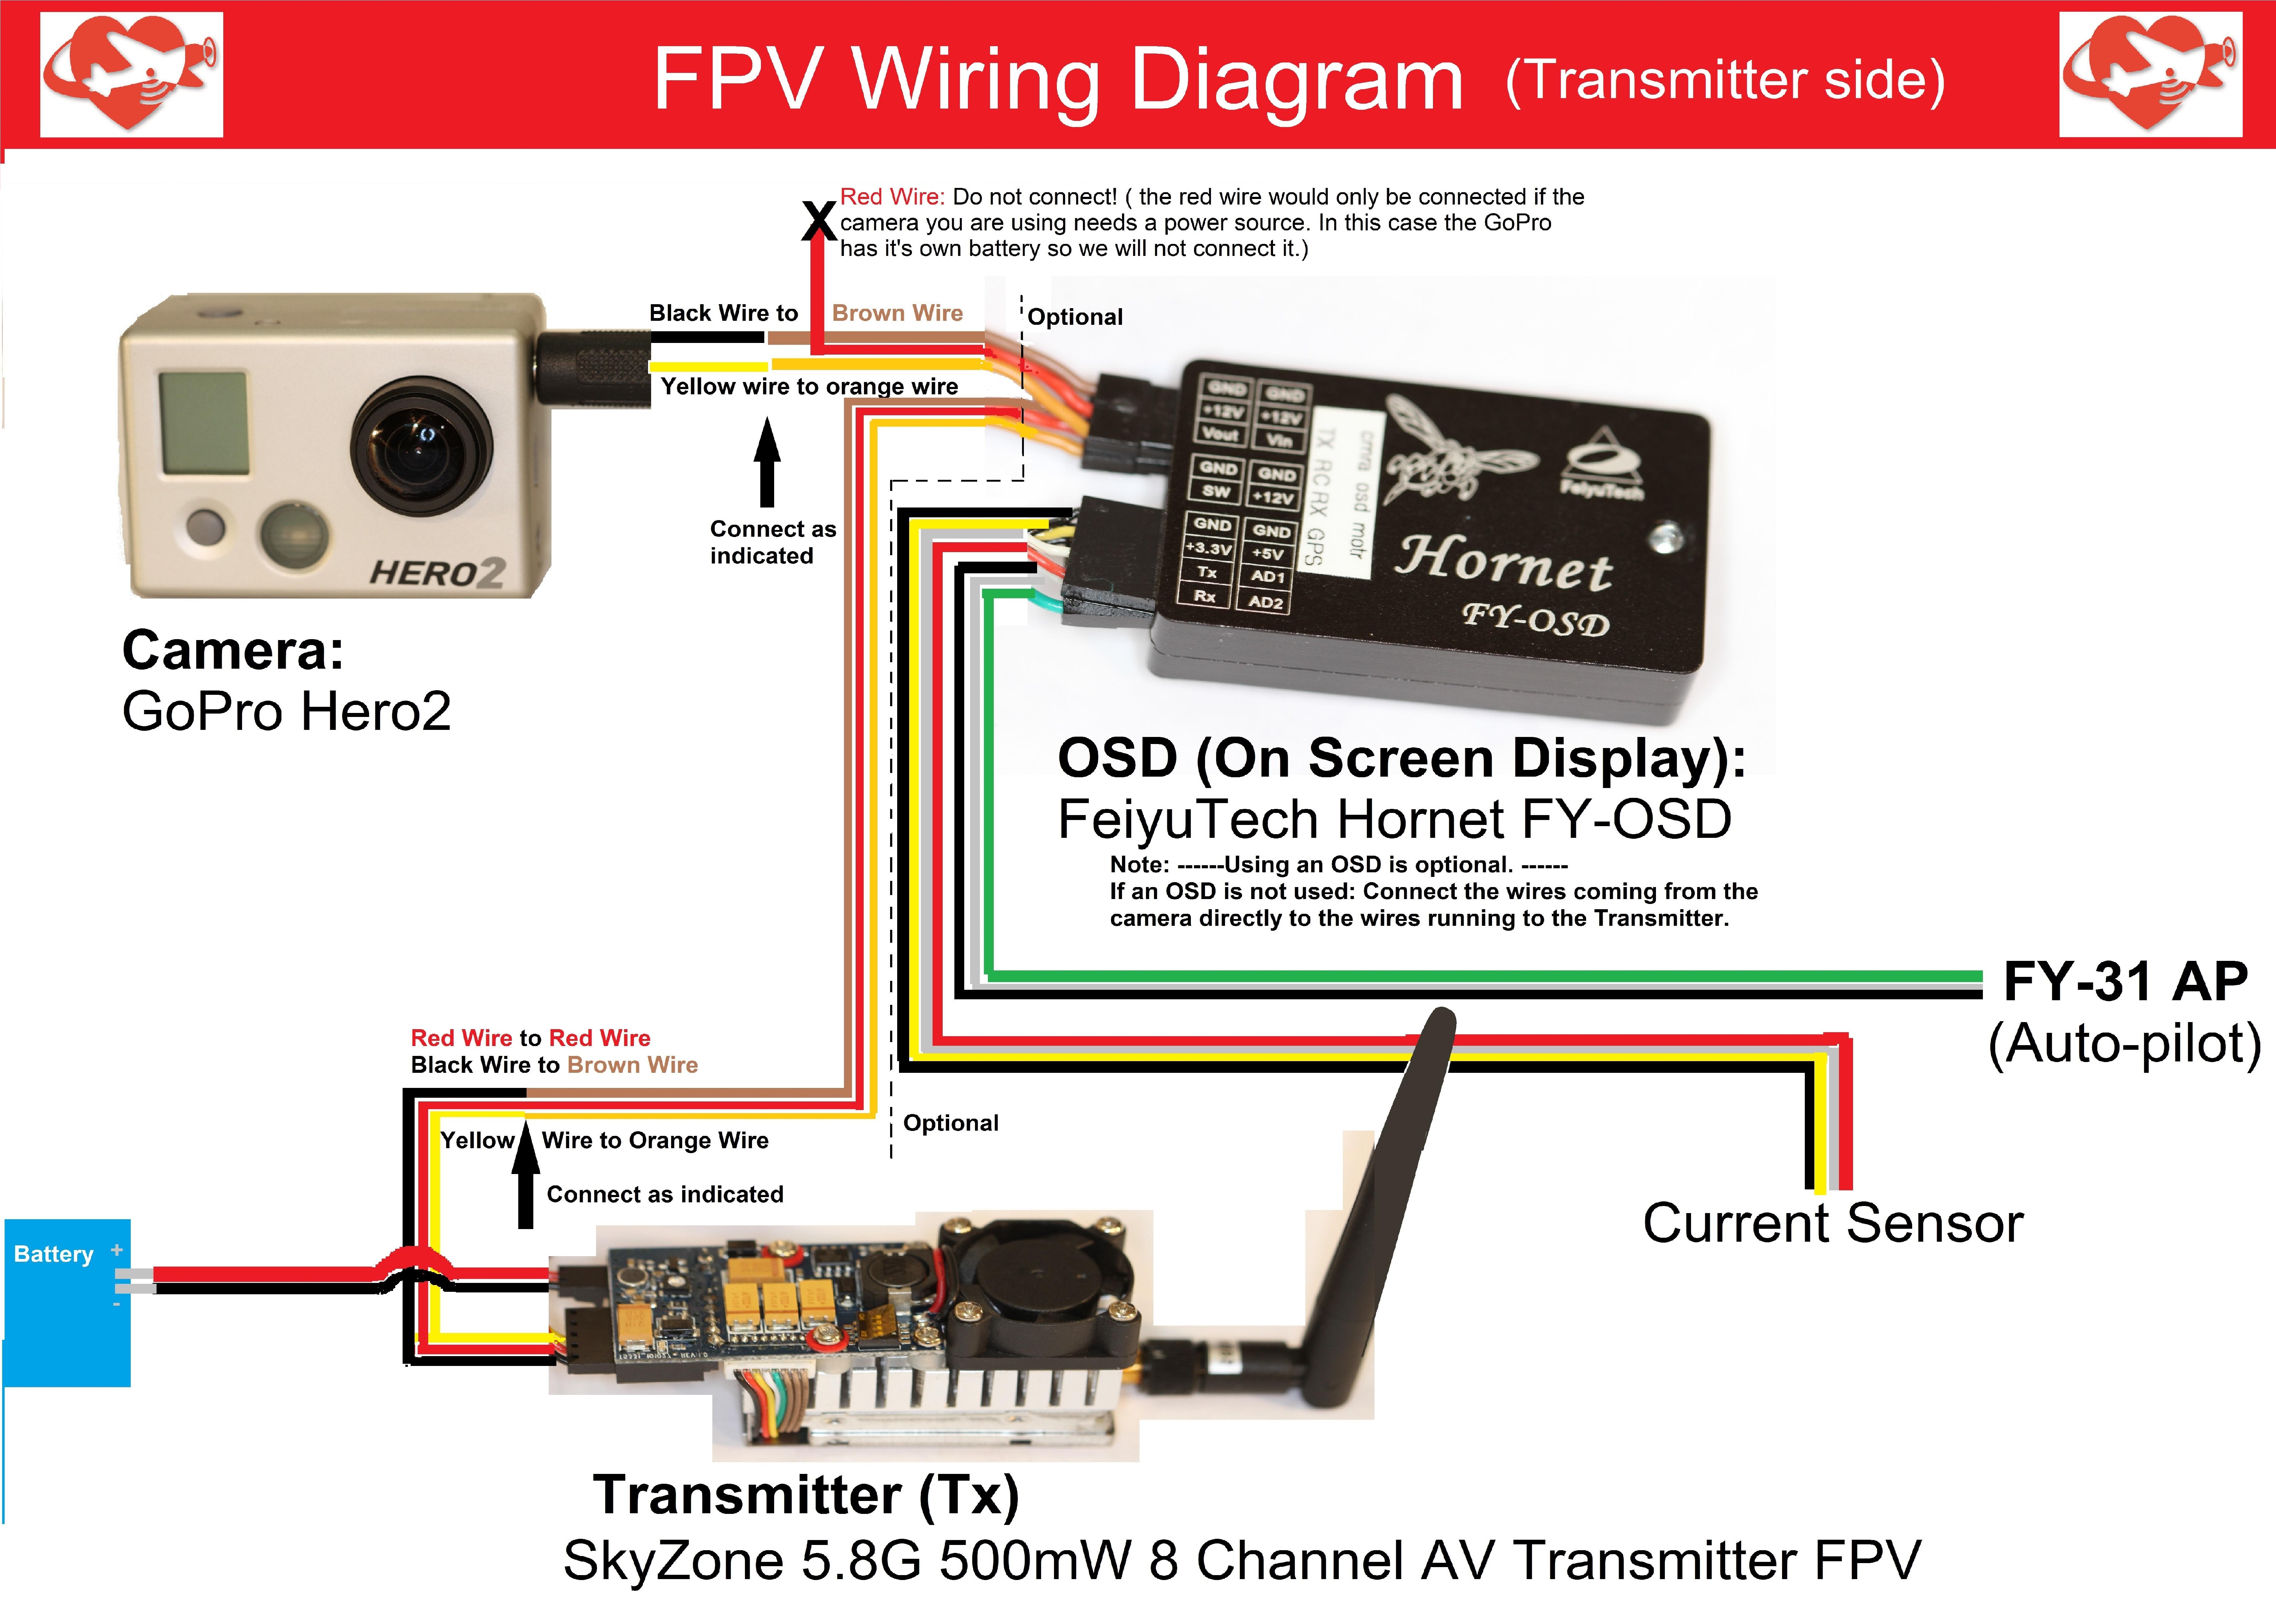 FPV layout